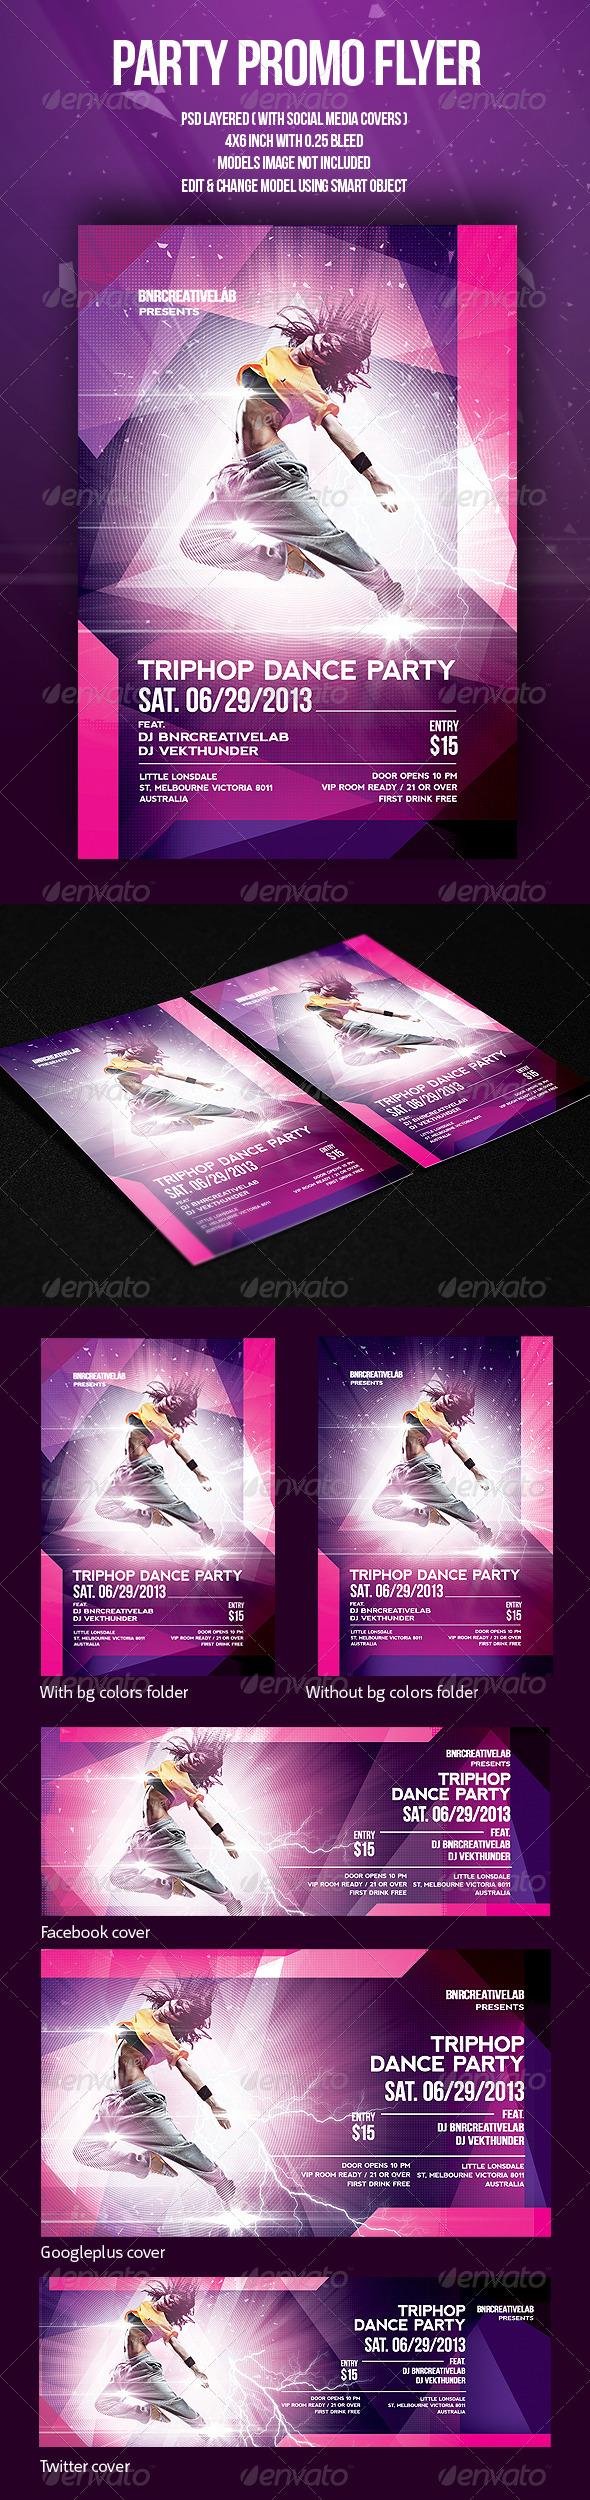 Triphop Dance Party Promo Flyer - Clubs & Parties Events